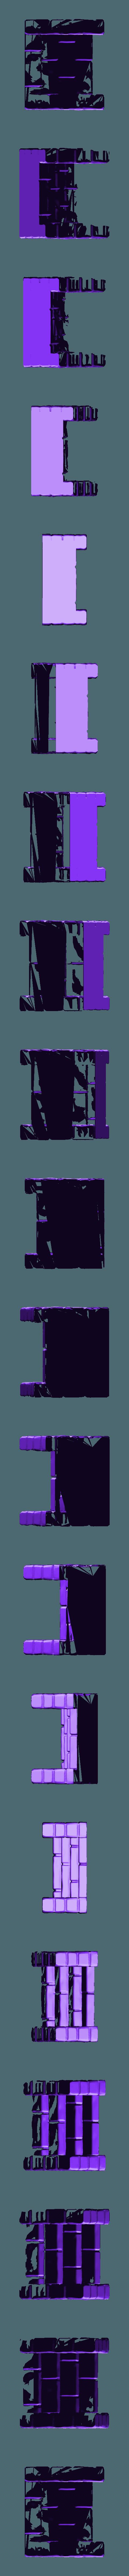 stairsmall2.stl Download free STL file Fantasy city set • 3D printable model, HeribertoValle